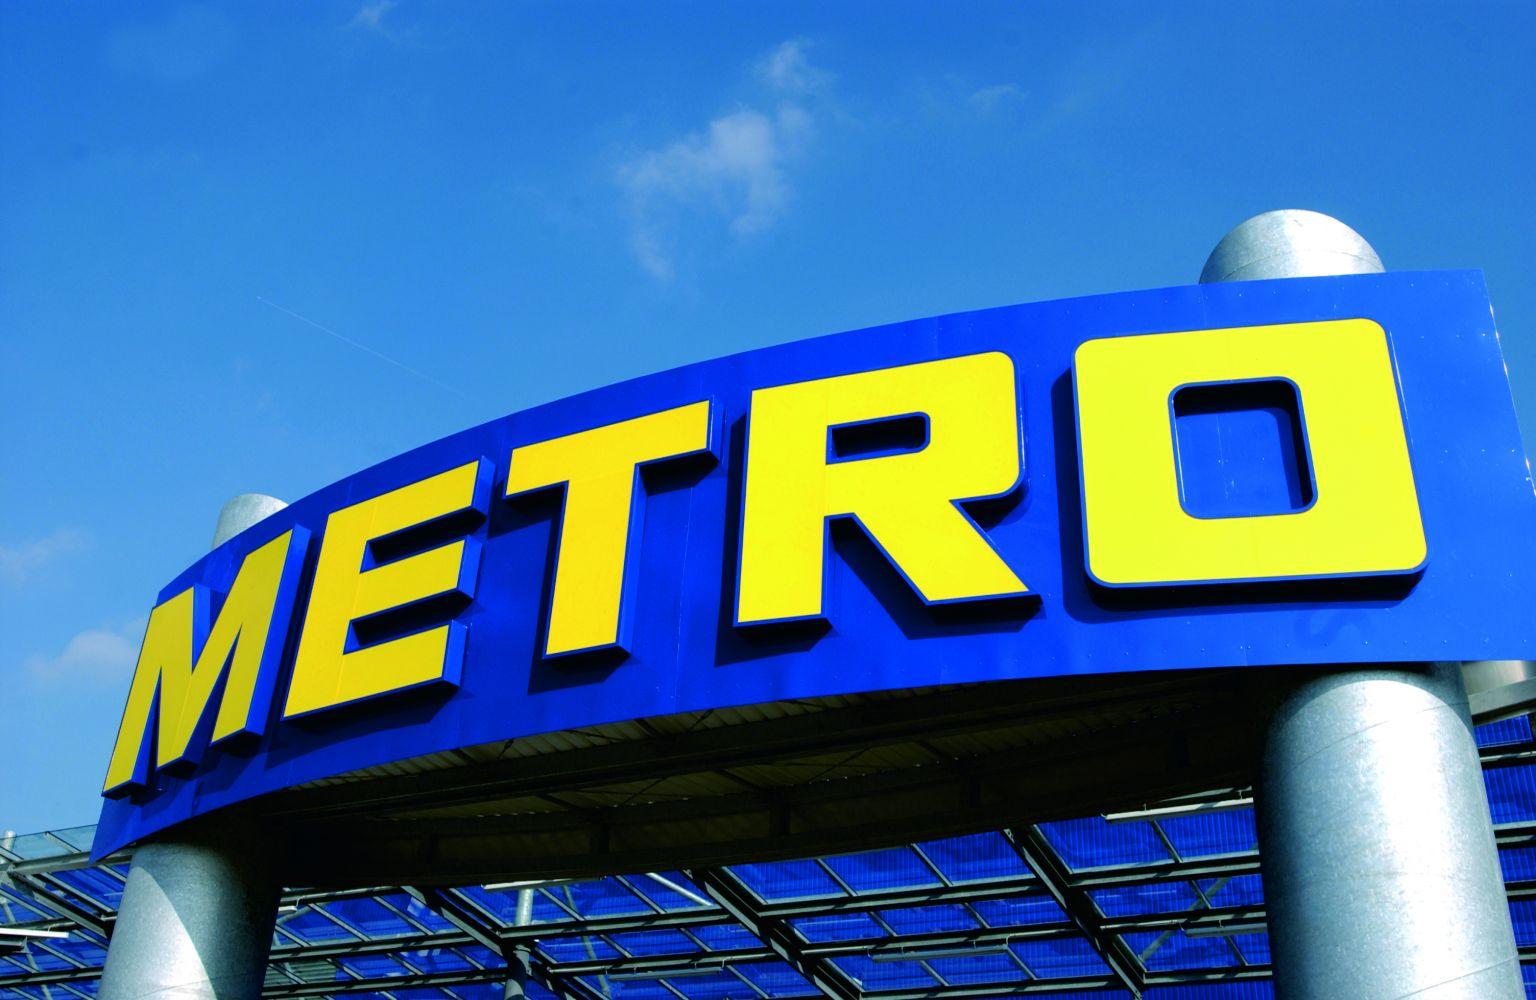 Metro übernimmt Großhandelsmärkte der REWE Group